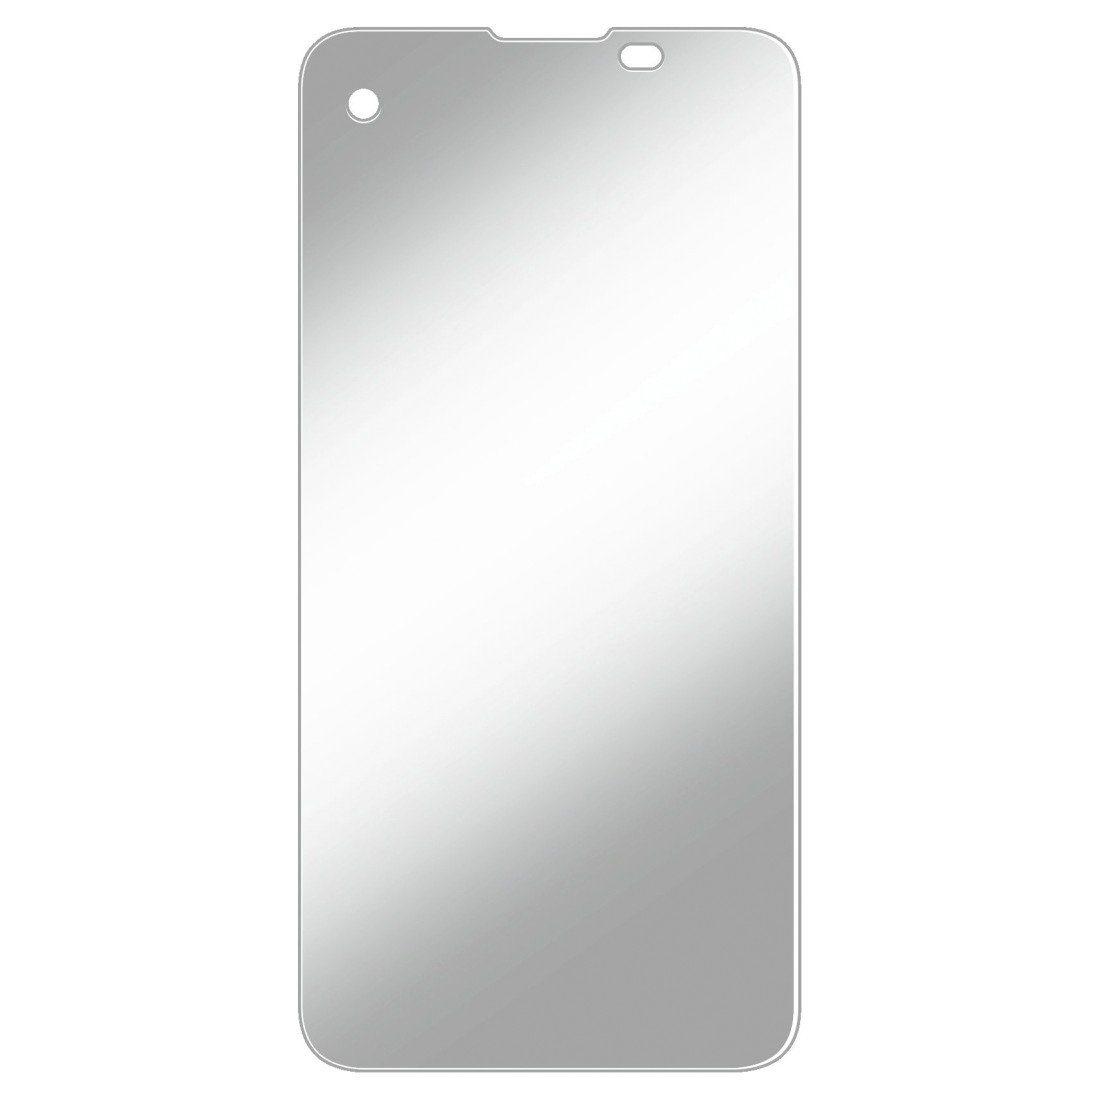 Hama Display-Schutzfolie Crystal Clear für LG X Screen, 2 Stück